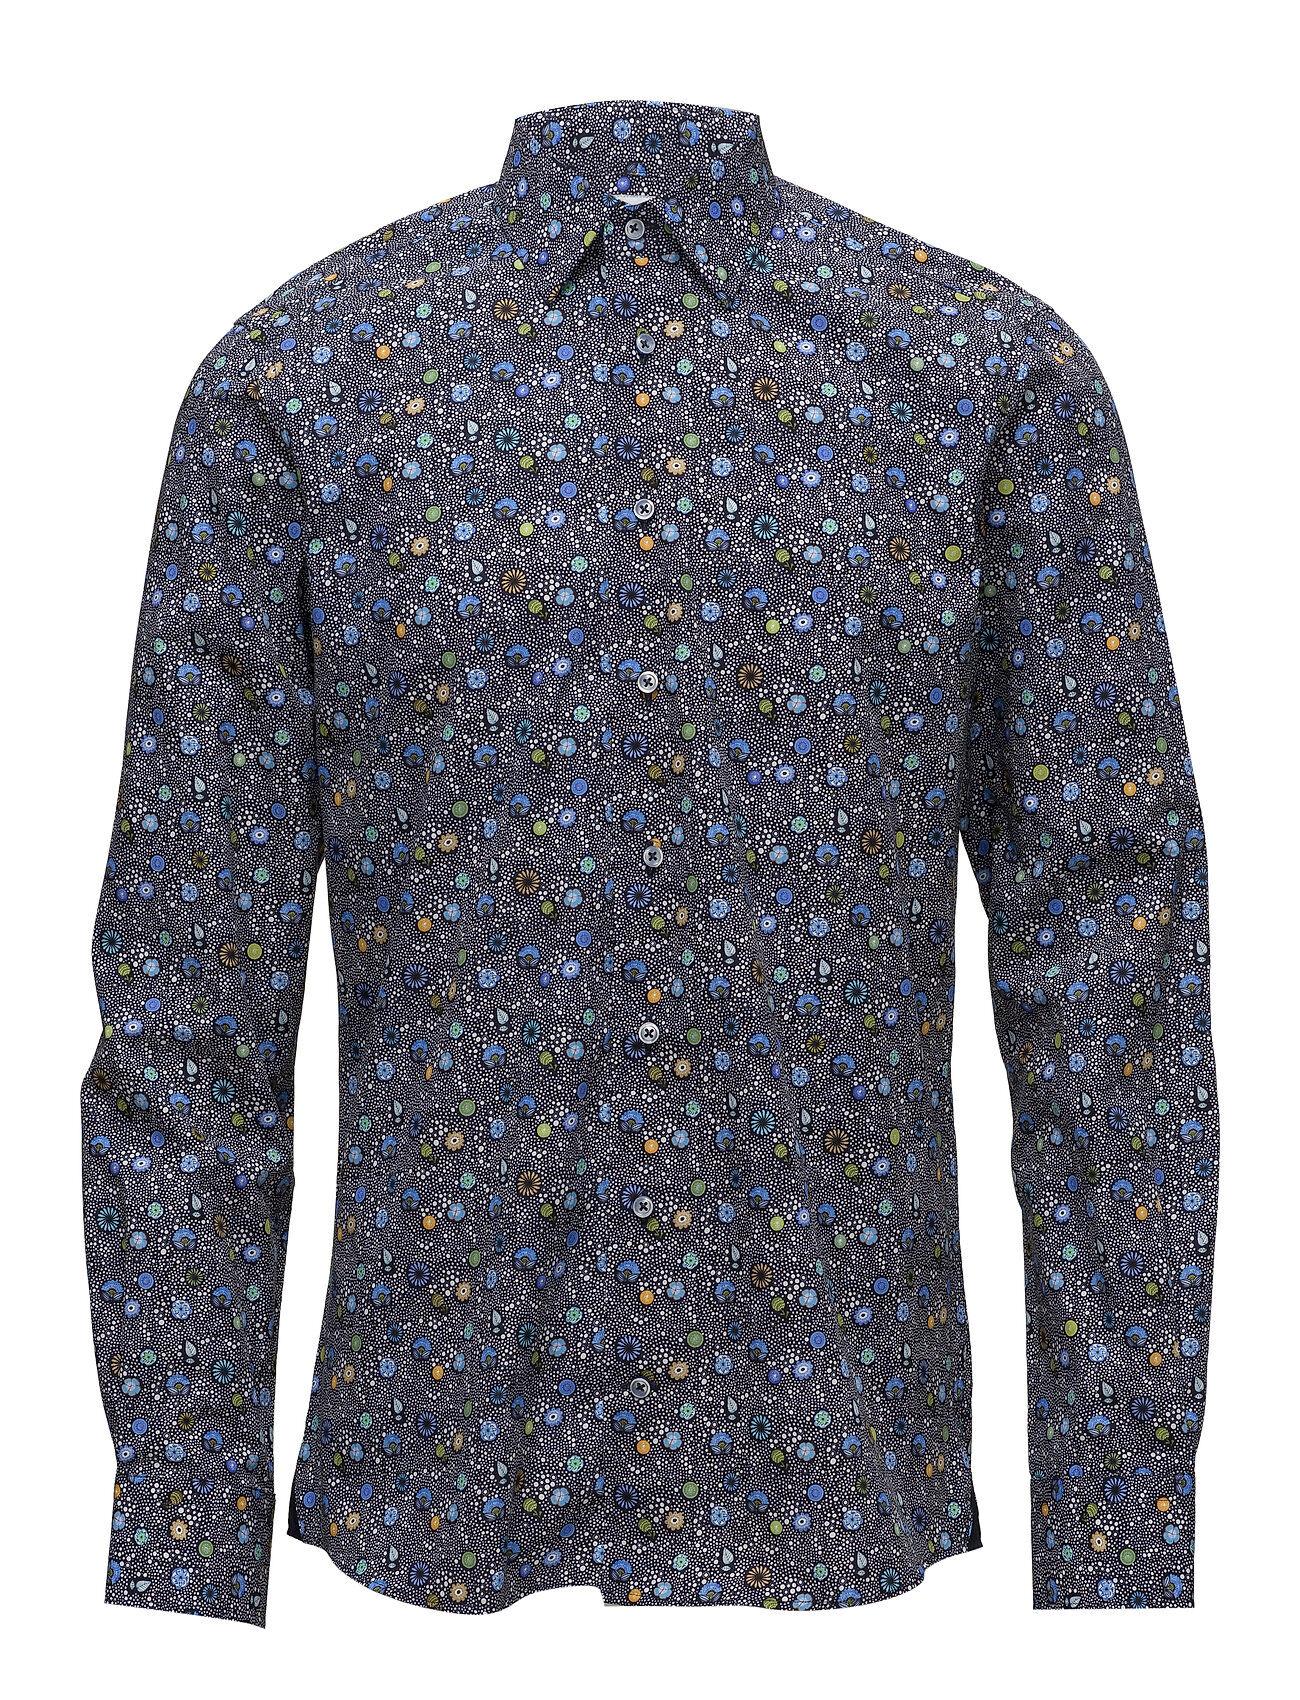 XO Shirtmaker by Sand Copenhagen 8068 - Gordon Sc